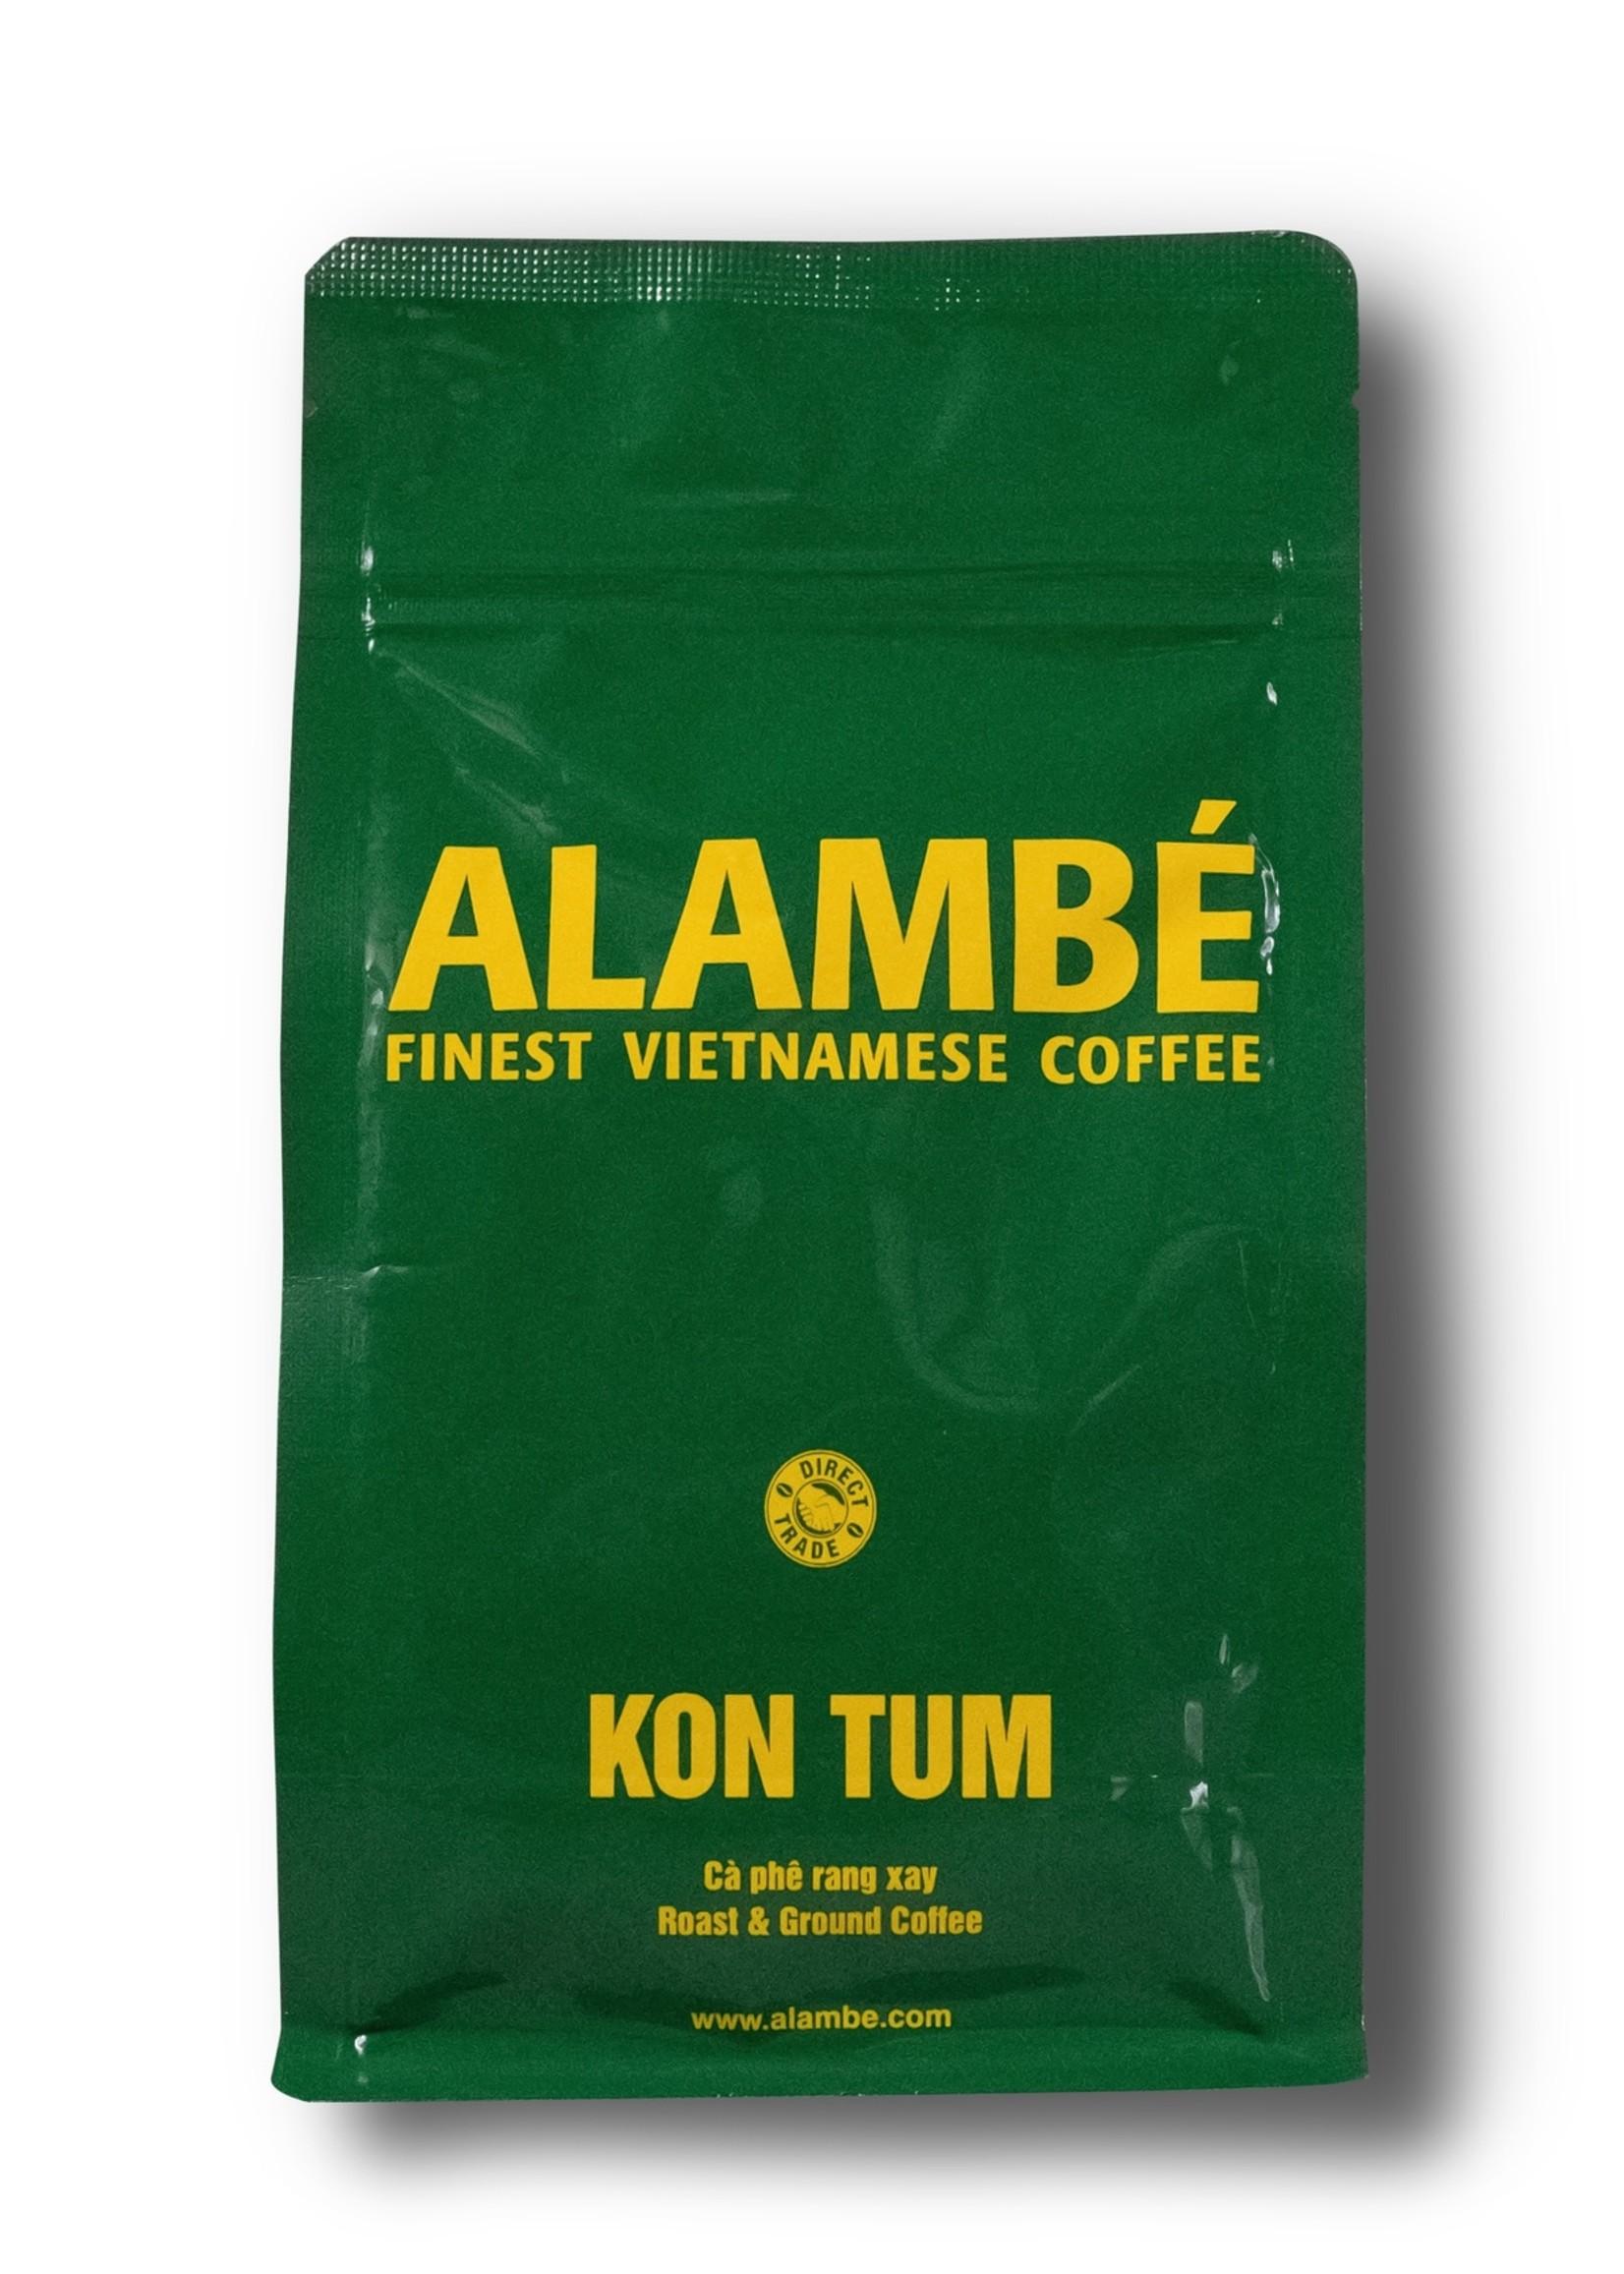 Alambé - Finest Vietnamese Coffee Kon Tum - 100% honey-processed Robusta from Vietnam (230g whole beans)